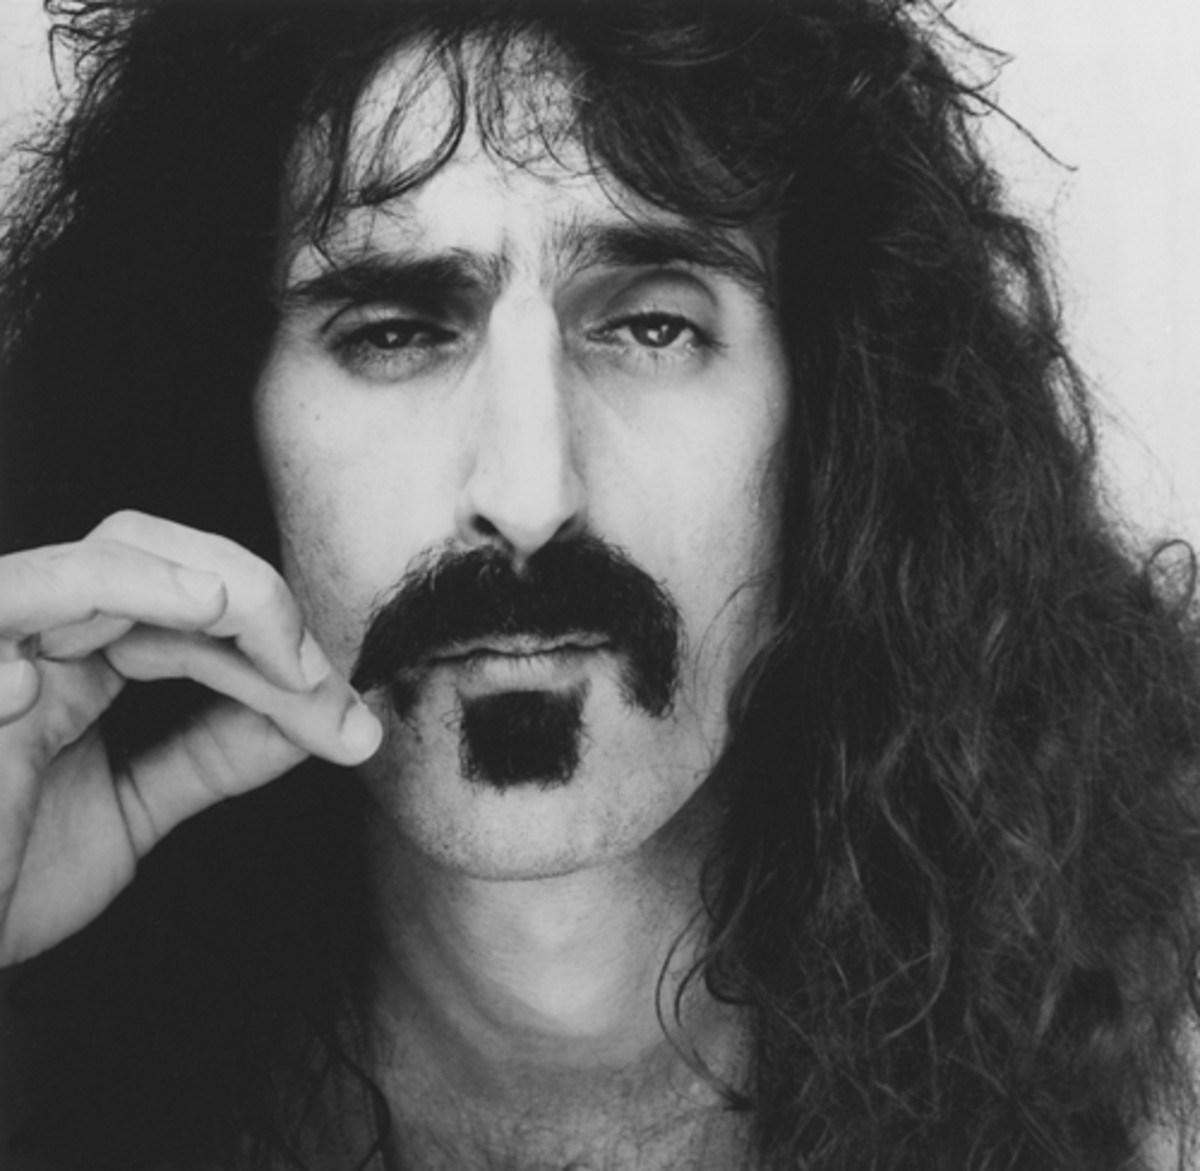 Frank Zappa in 1975. Photo courtesy Ryko/Doug Metzler, 1975